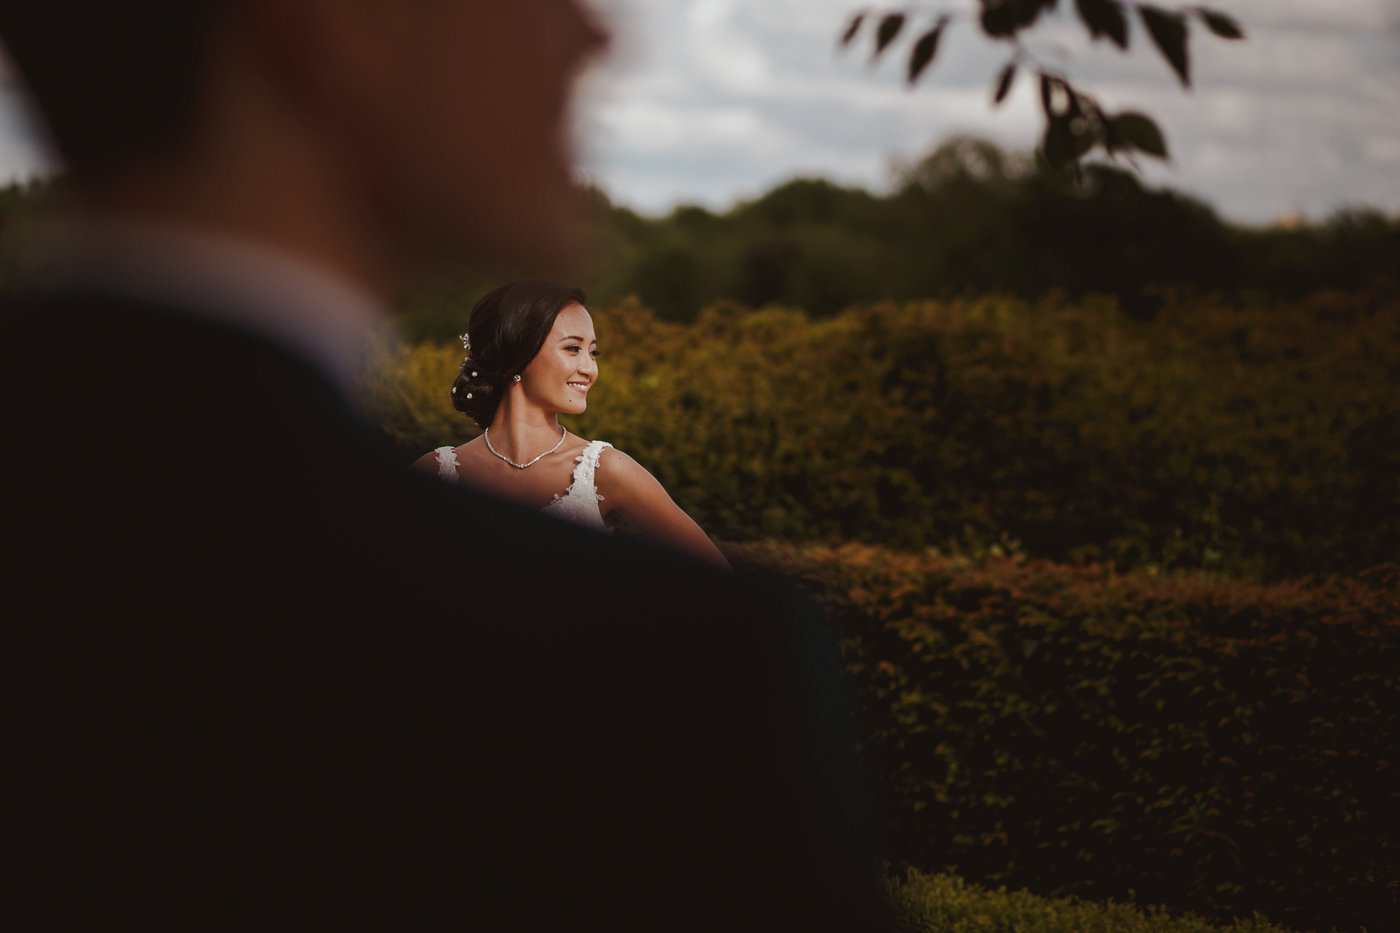 froyle-park-wedding-photography-31.jpg